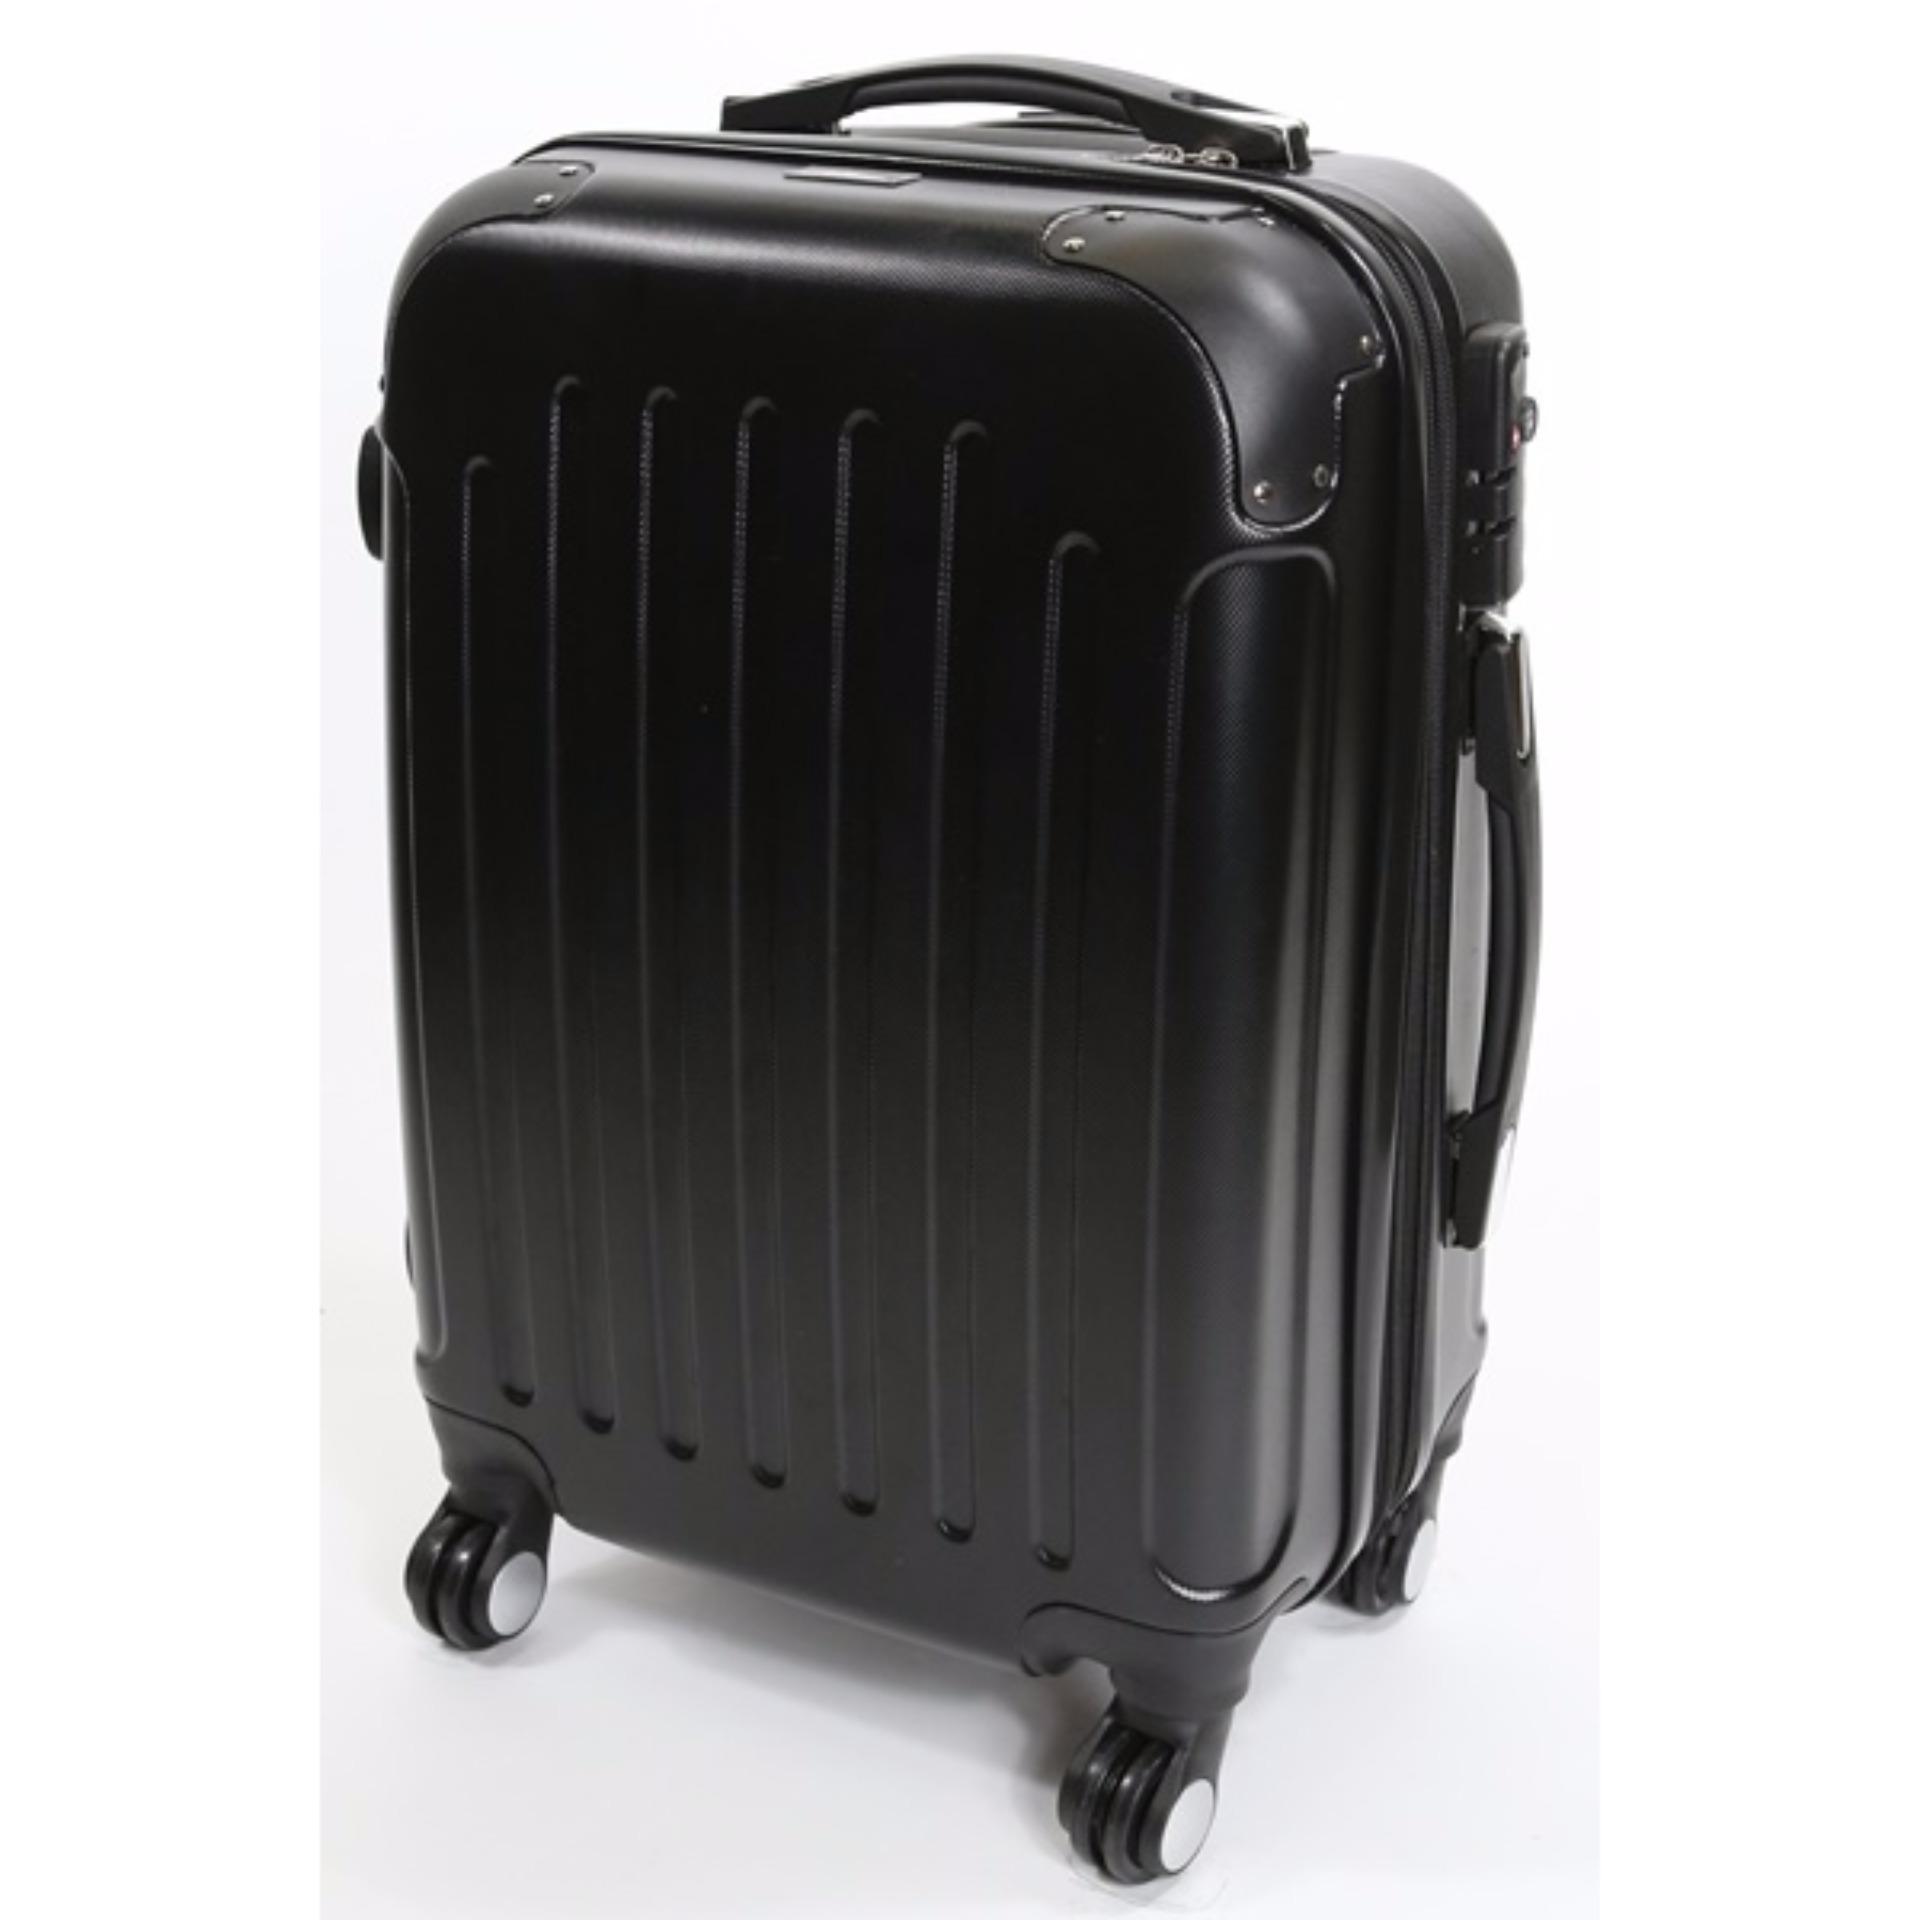 24 inch KEFI Premium Lightweight Expandable Luggage (Midnight Black)